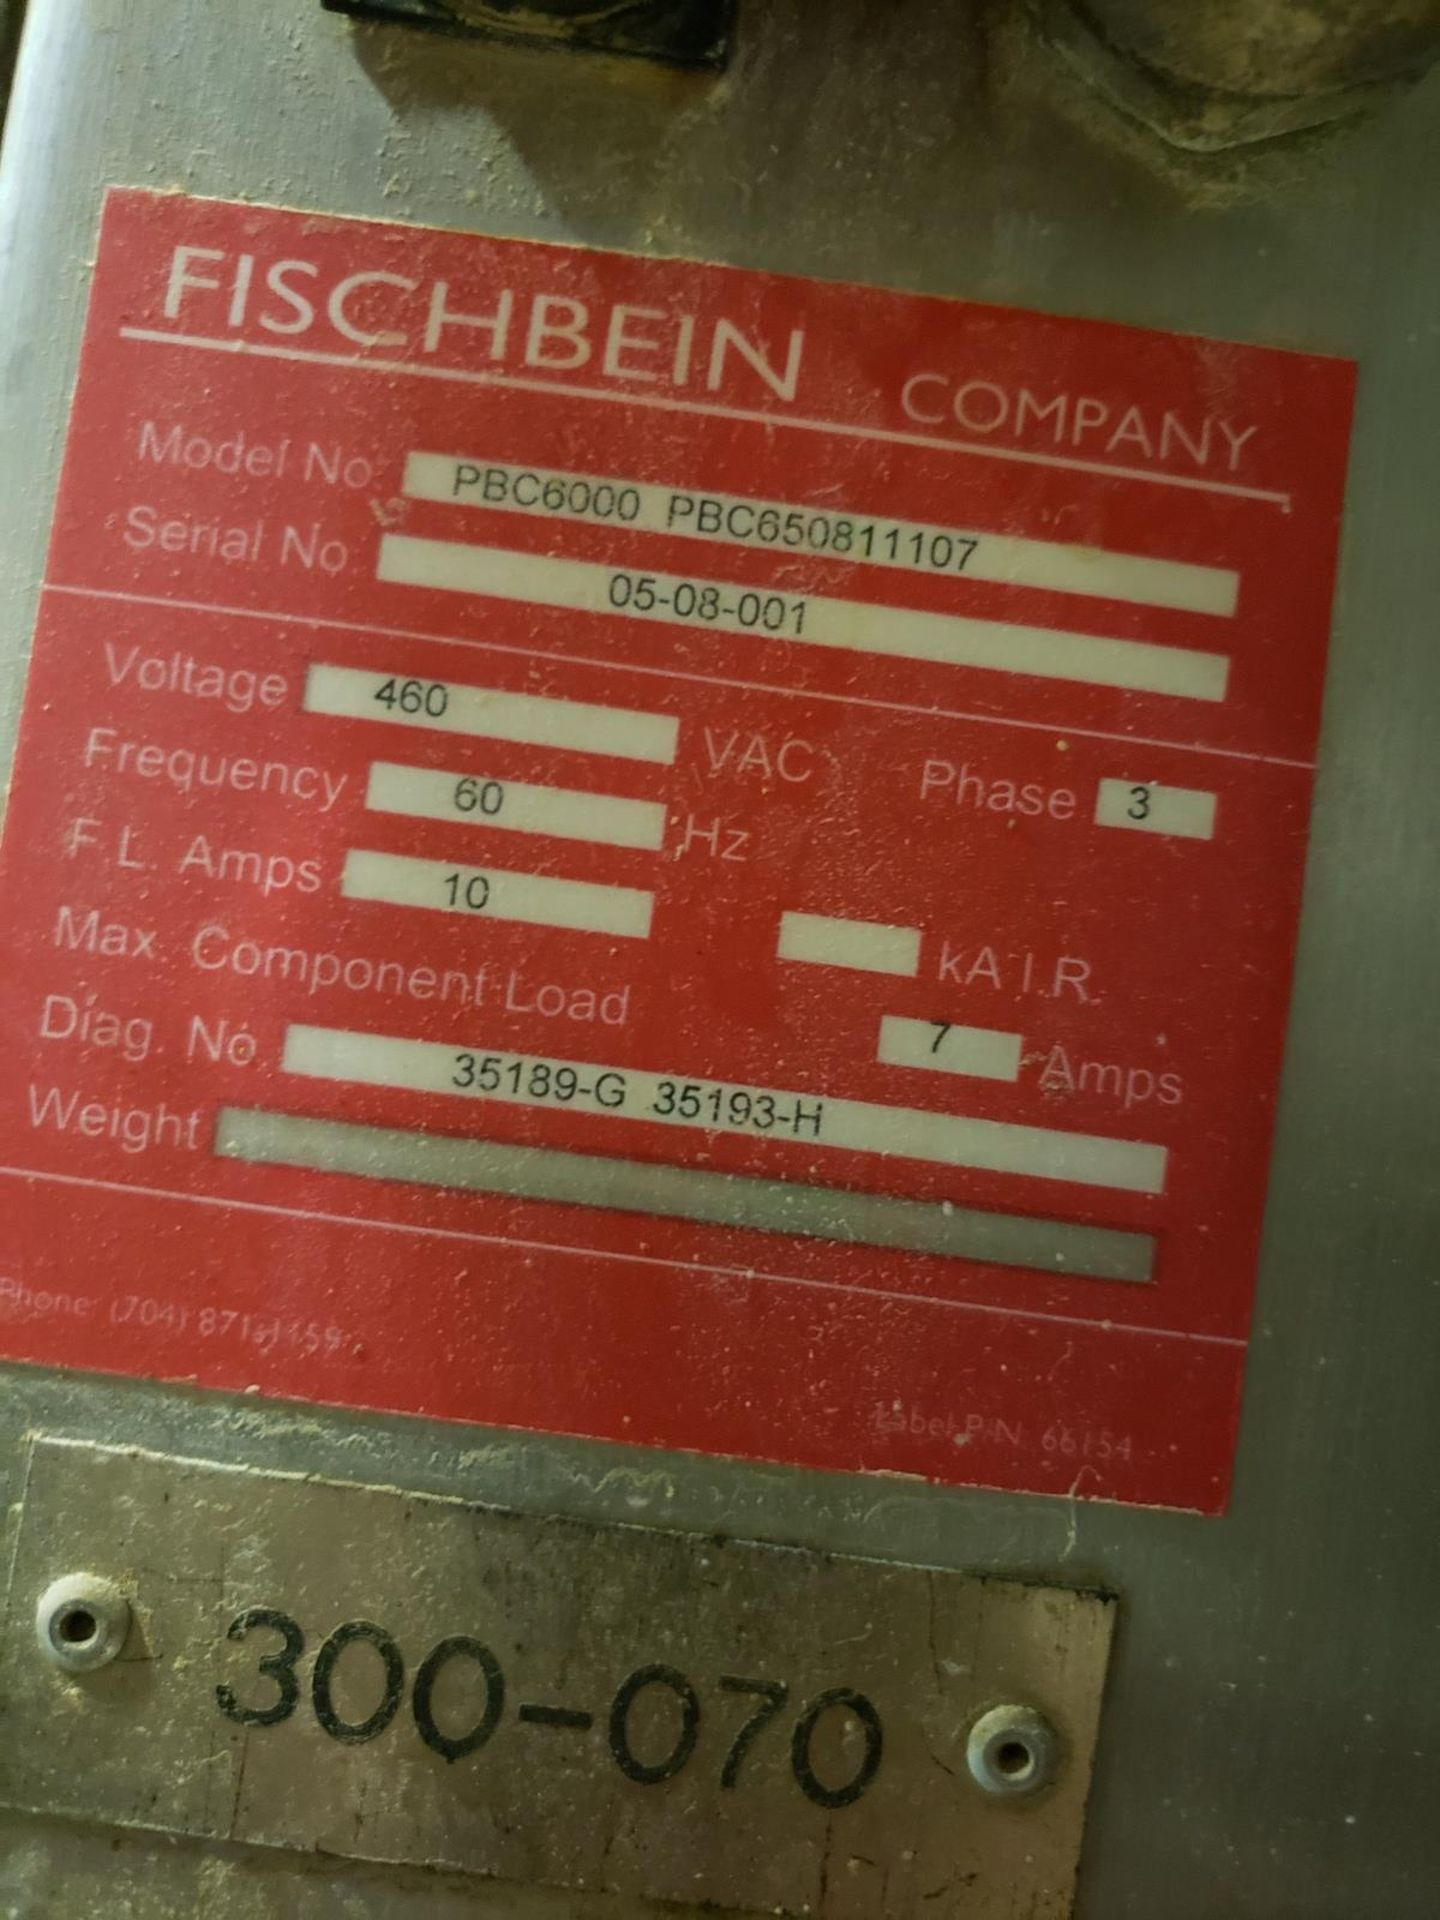 Lot 13 - Fischbein Bag Sealer, M# PBC6000 PBC650811107, S/N 05-08-001 - Loc: NJ | Rig Fee: $75